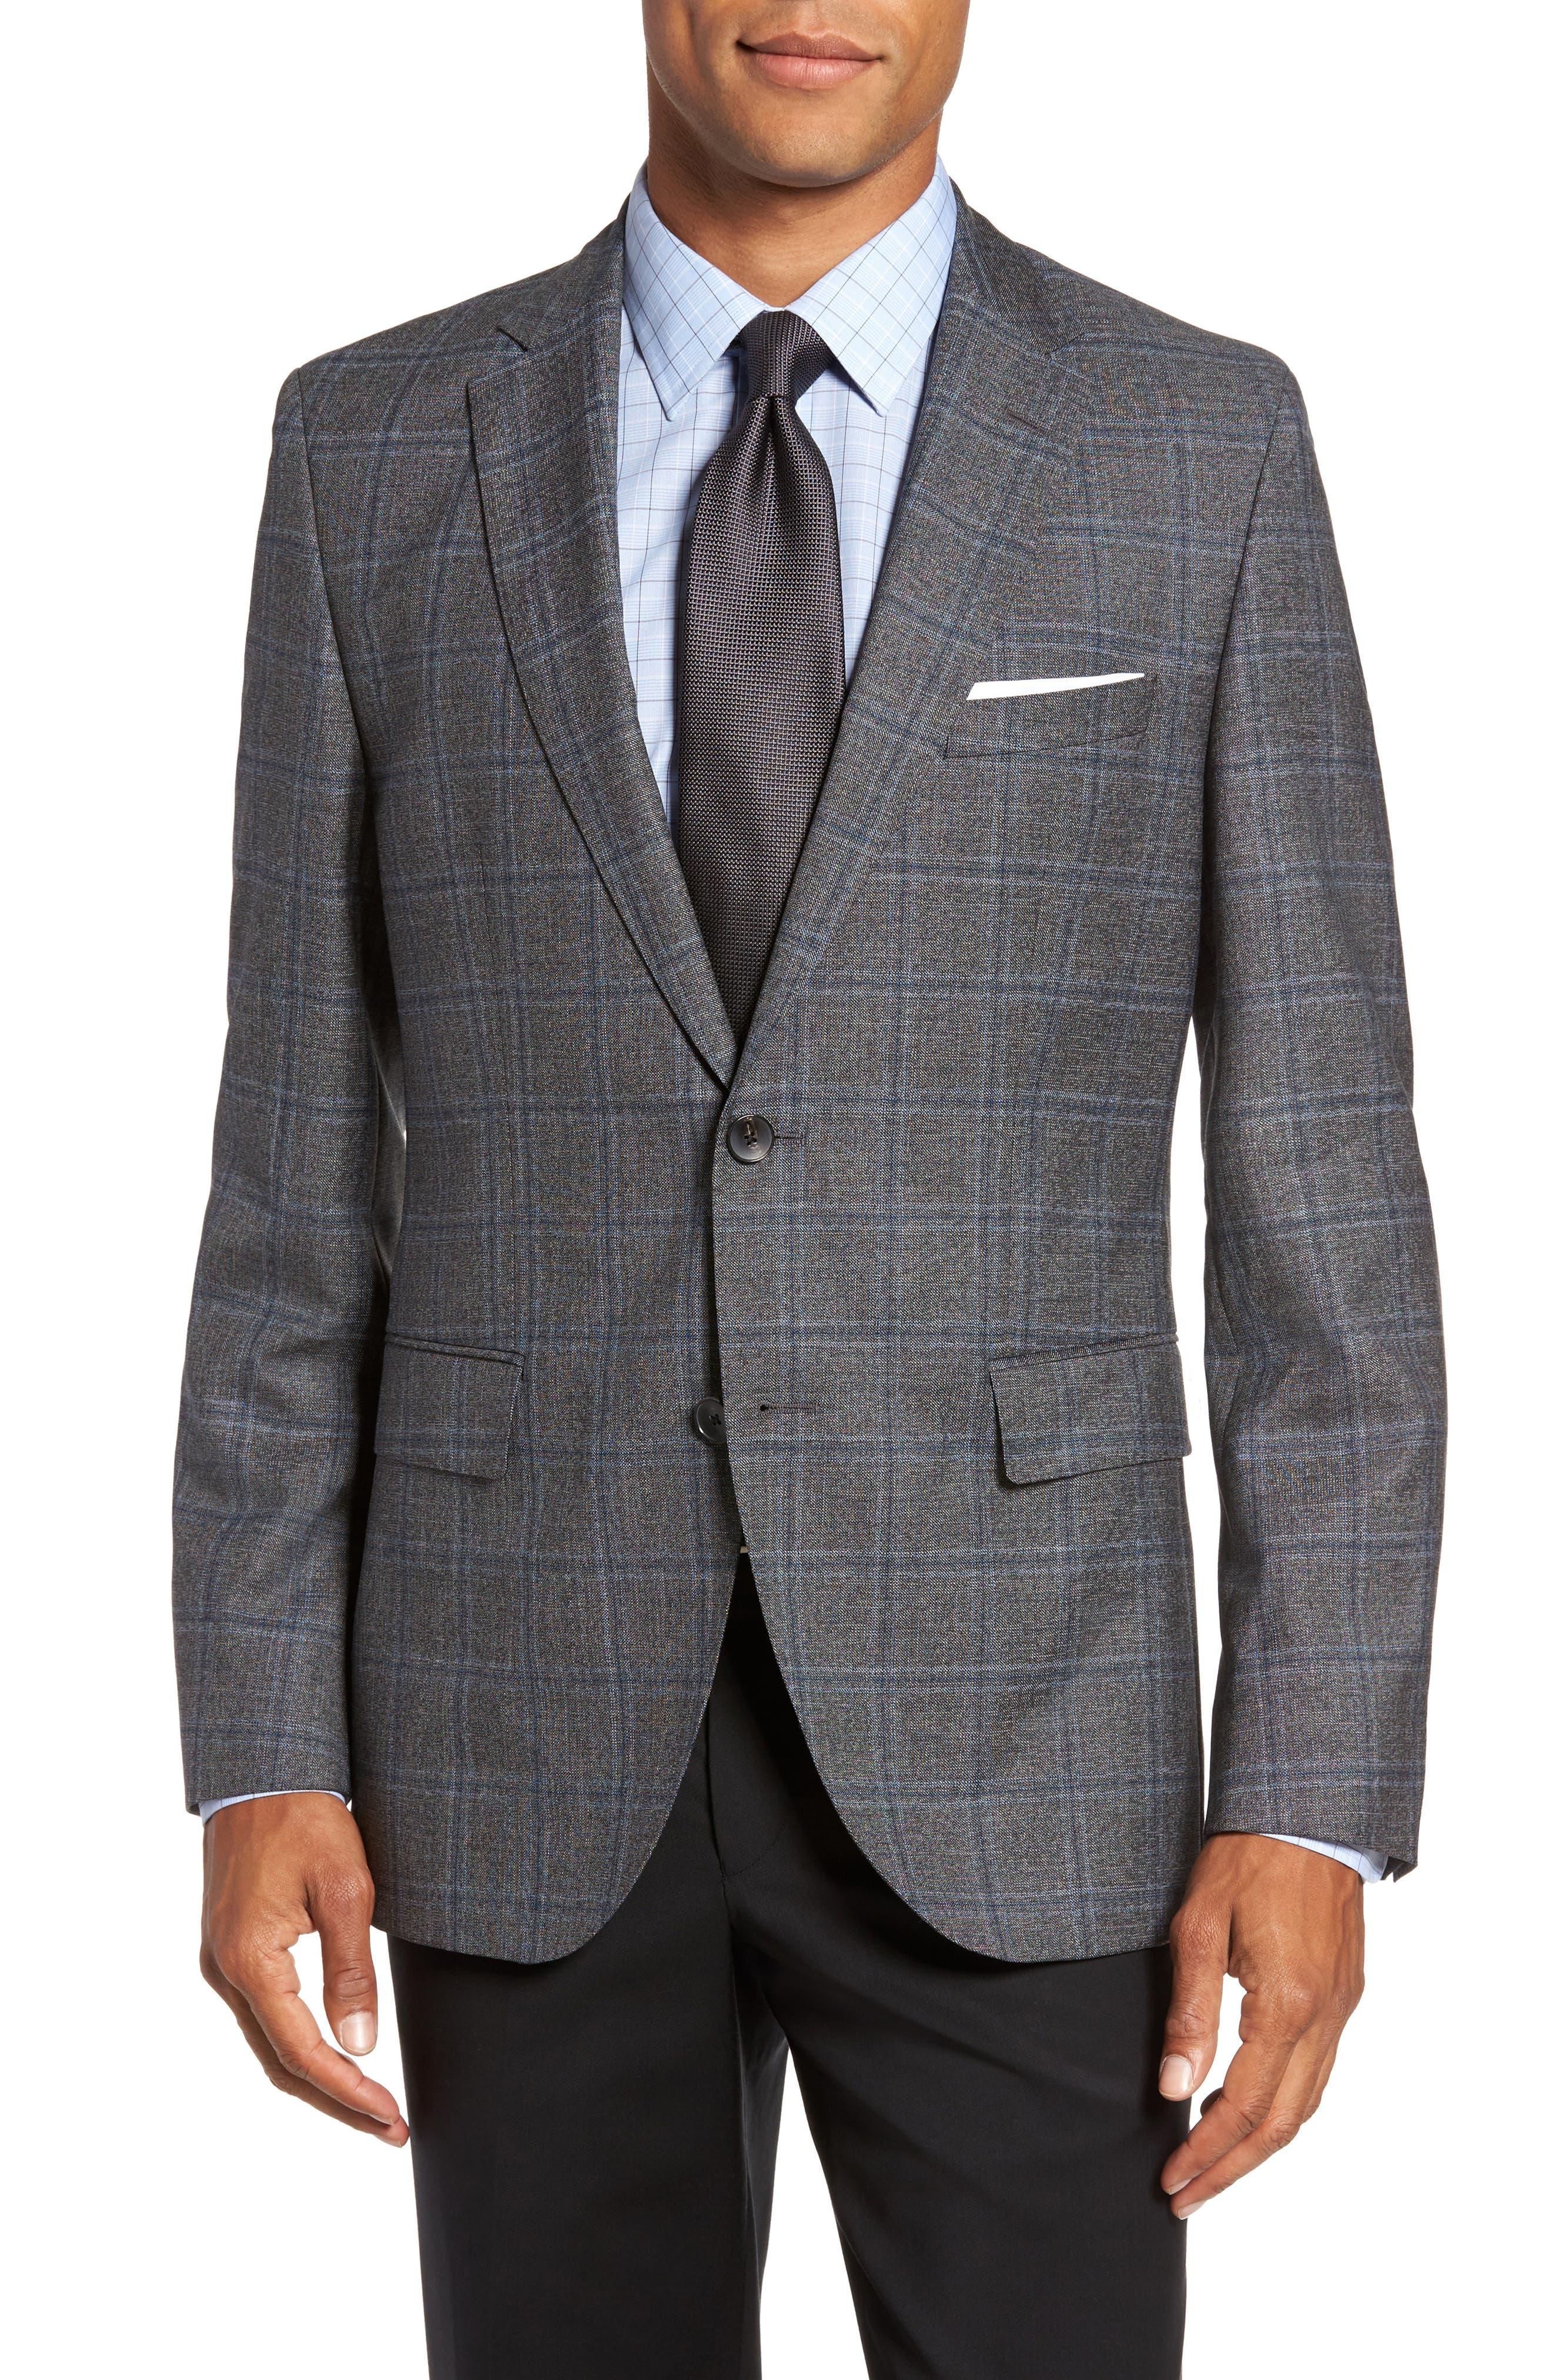 Jeen Trim Fit Wool Sport Coat,                         Main,                         color, Open Grey